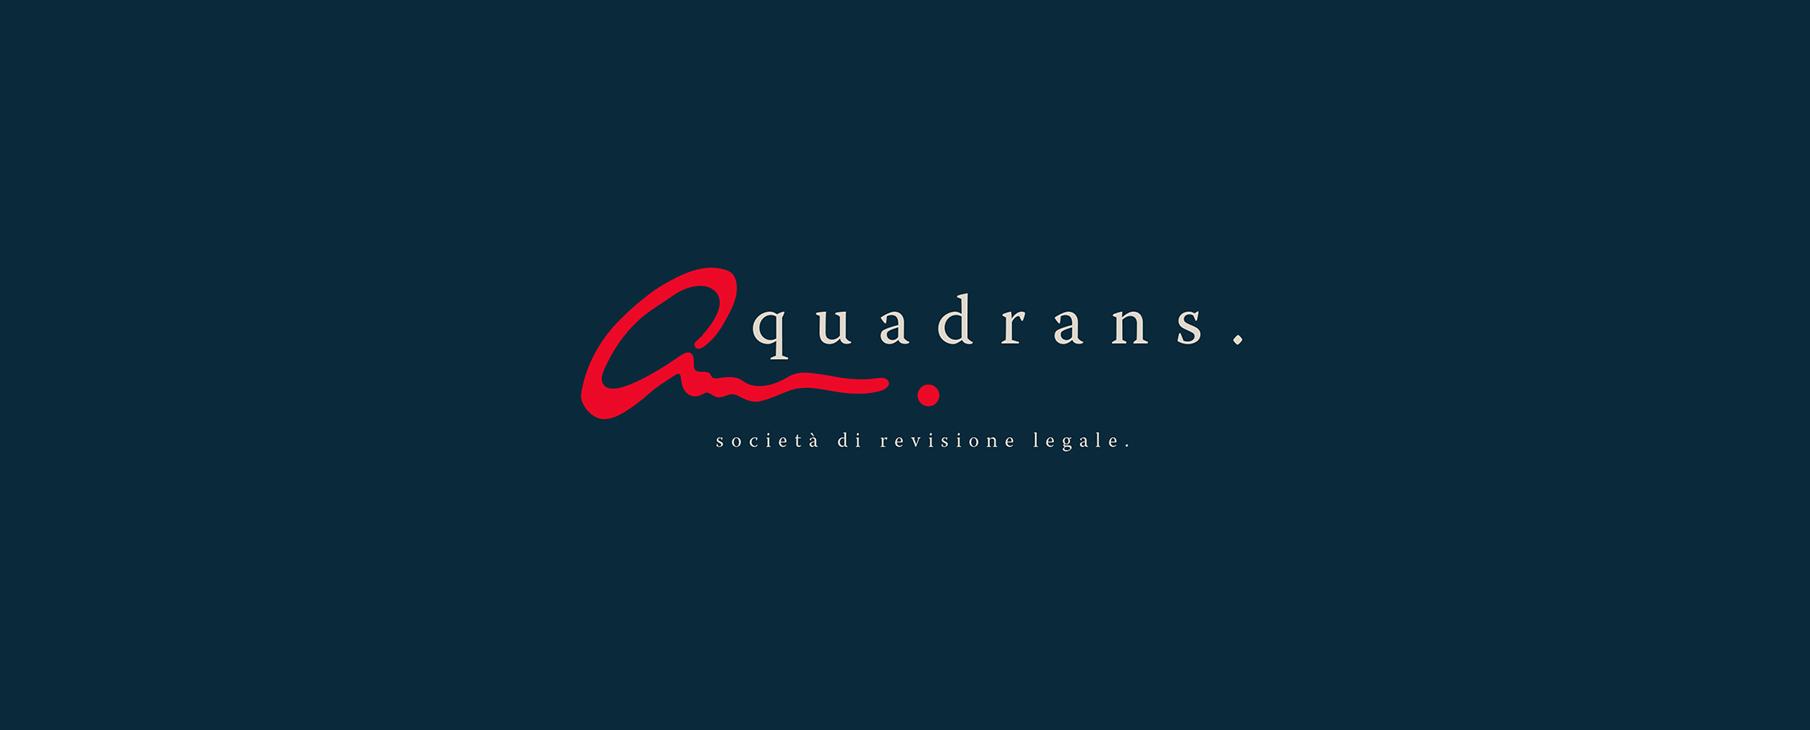 quadrans_project_brand